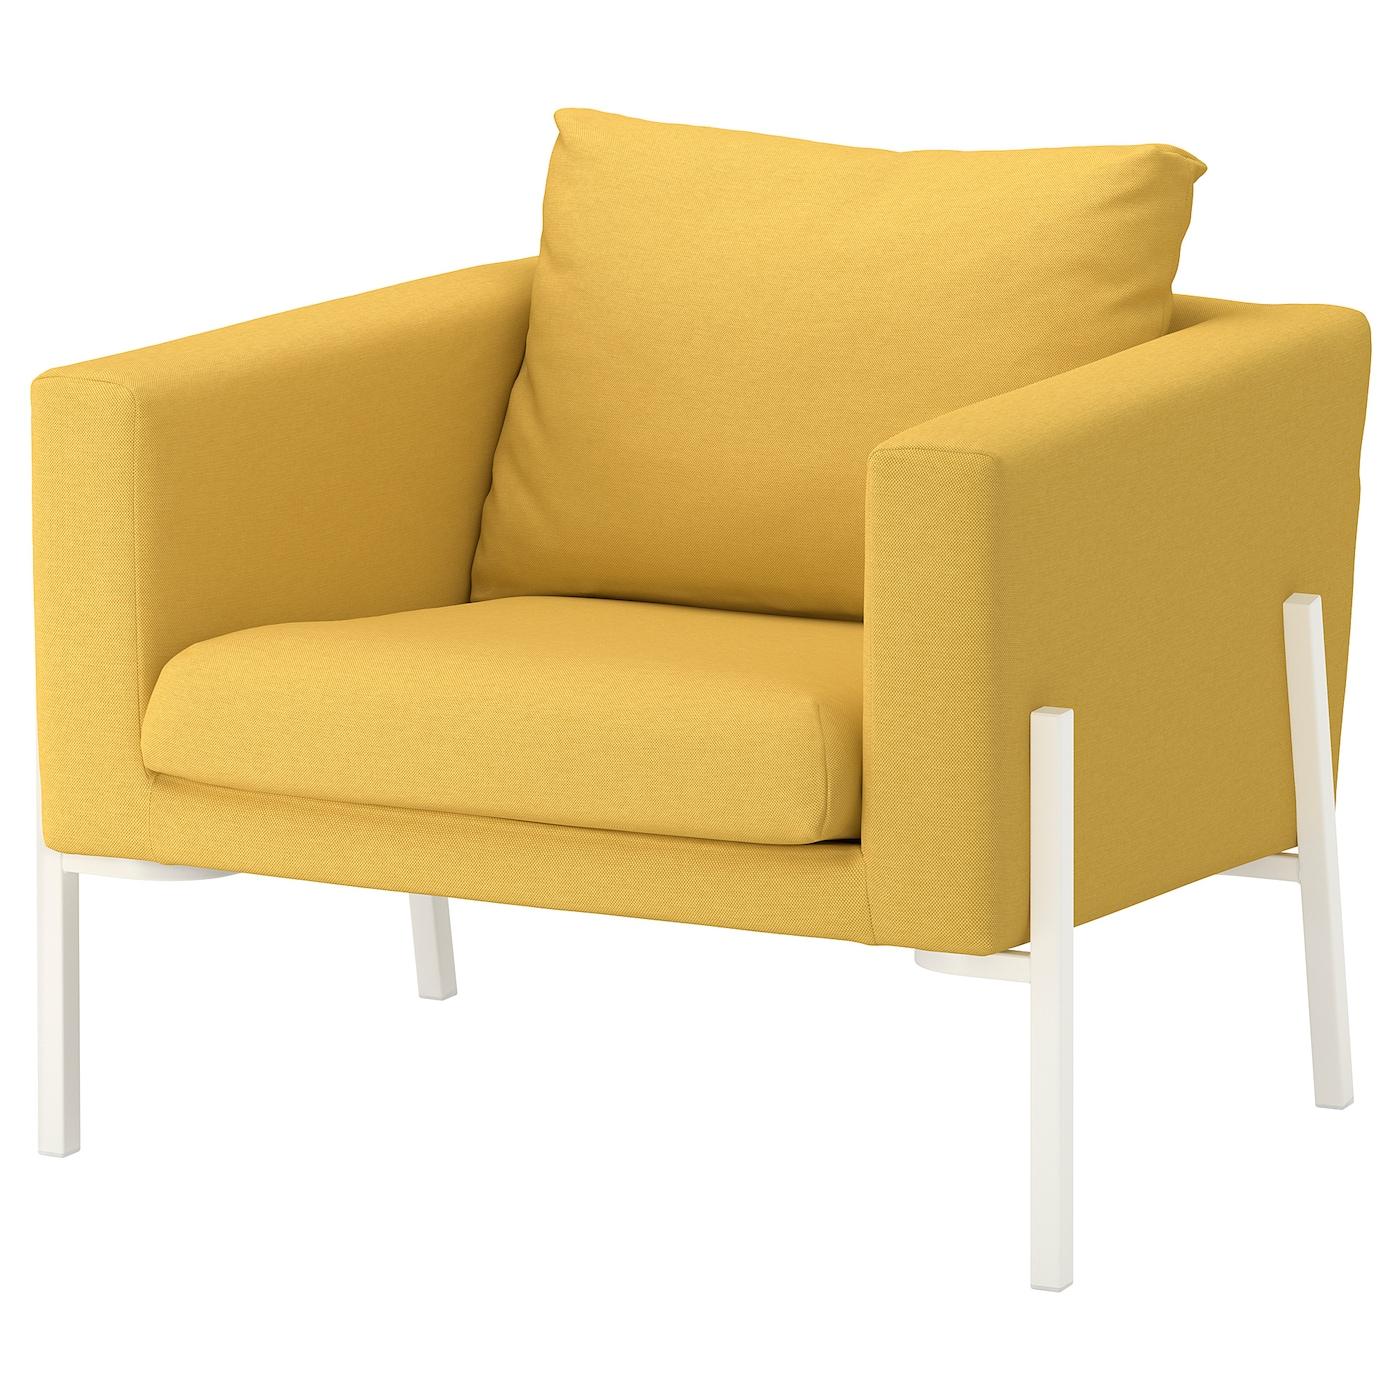 Koarp fauteuil orrsta jaune dor blanc ikea - Fauteuil blanc ikea ...